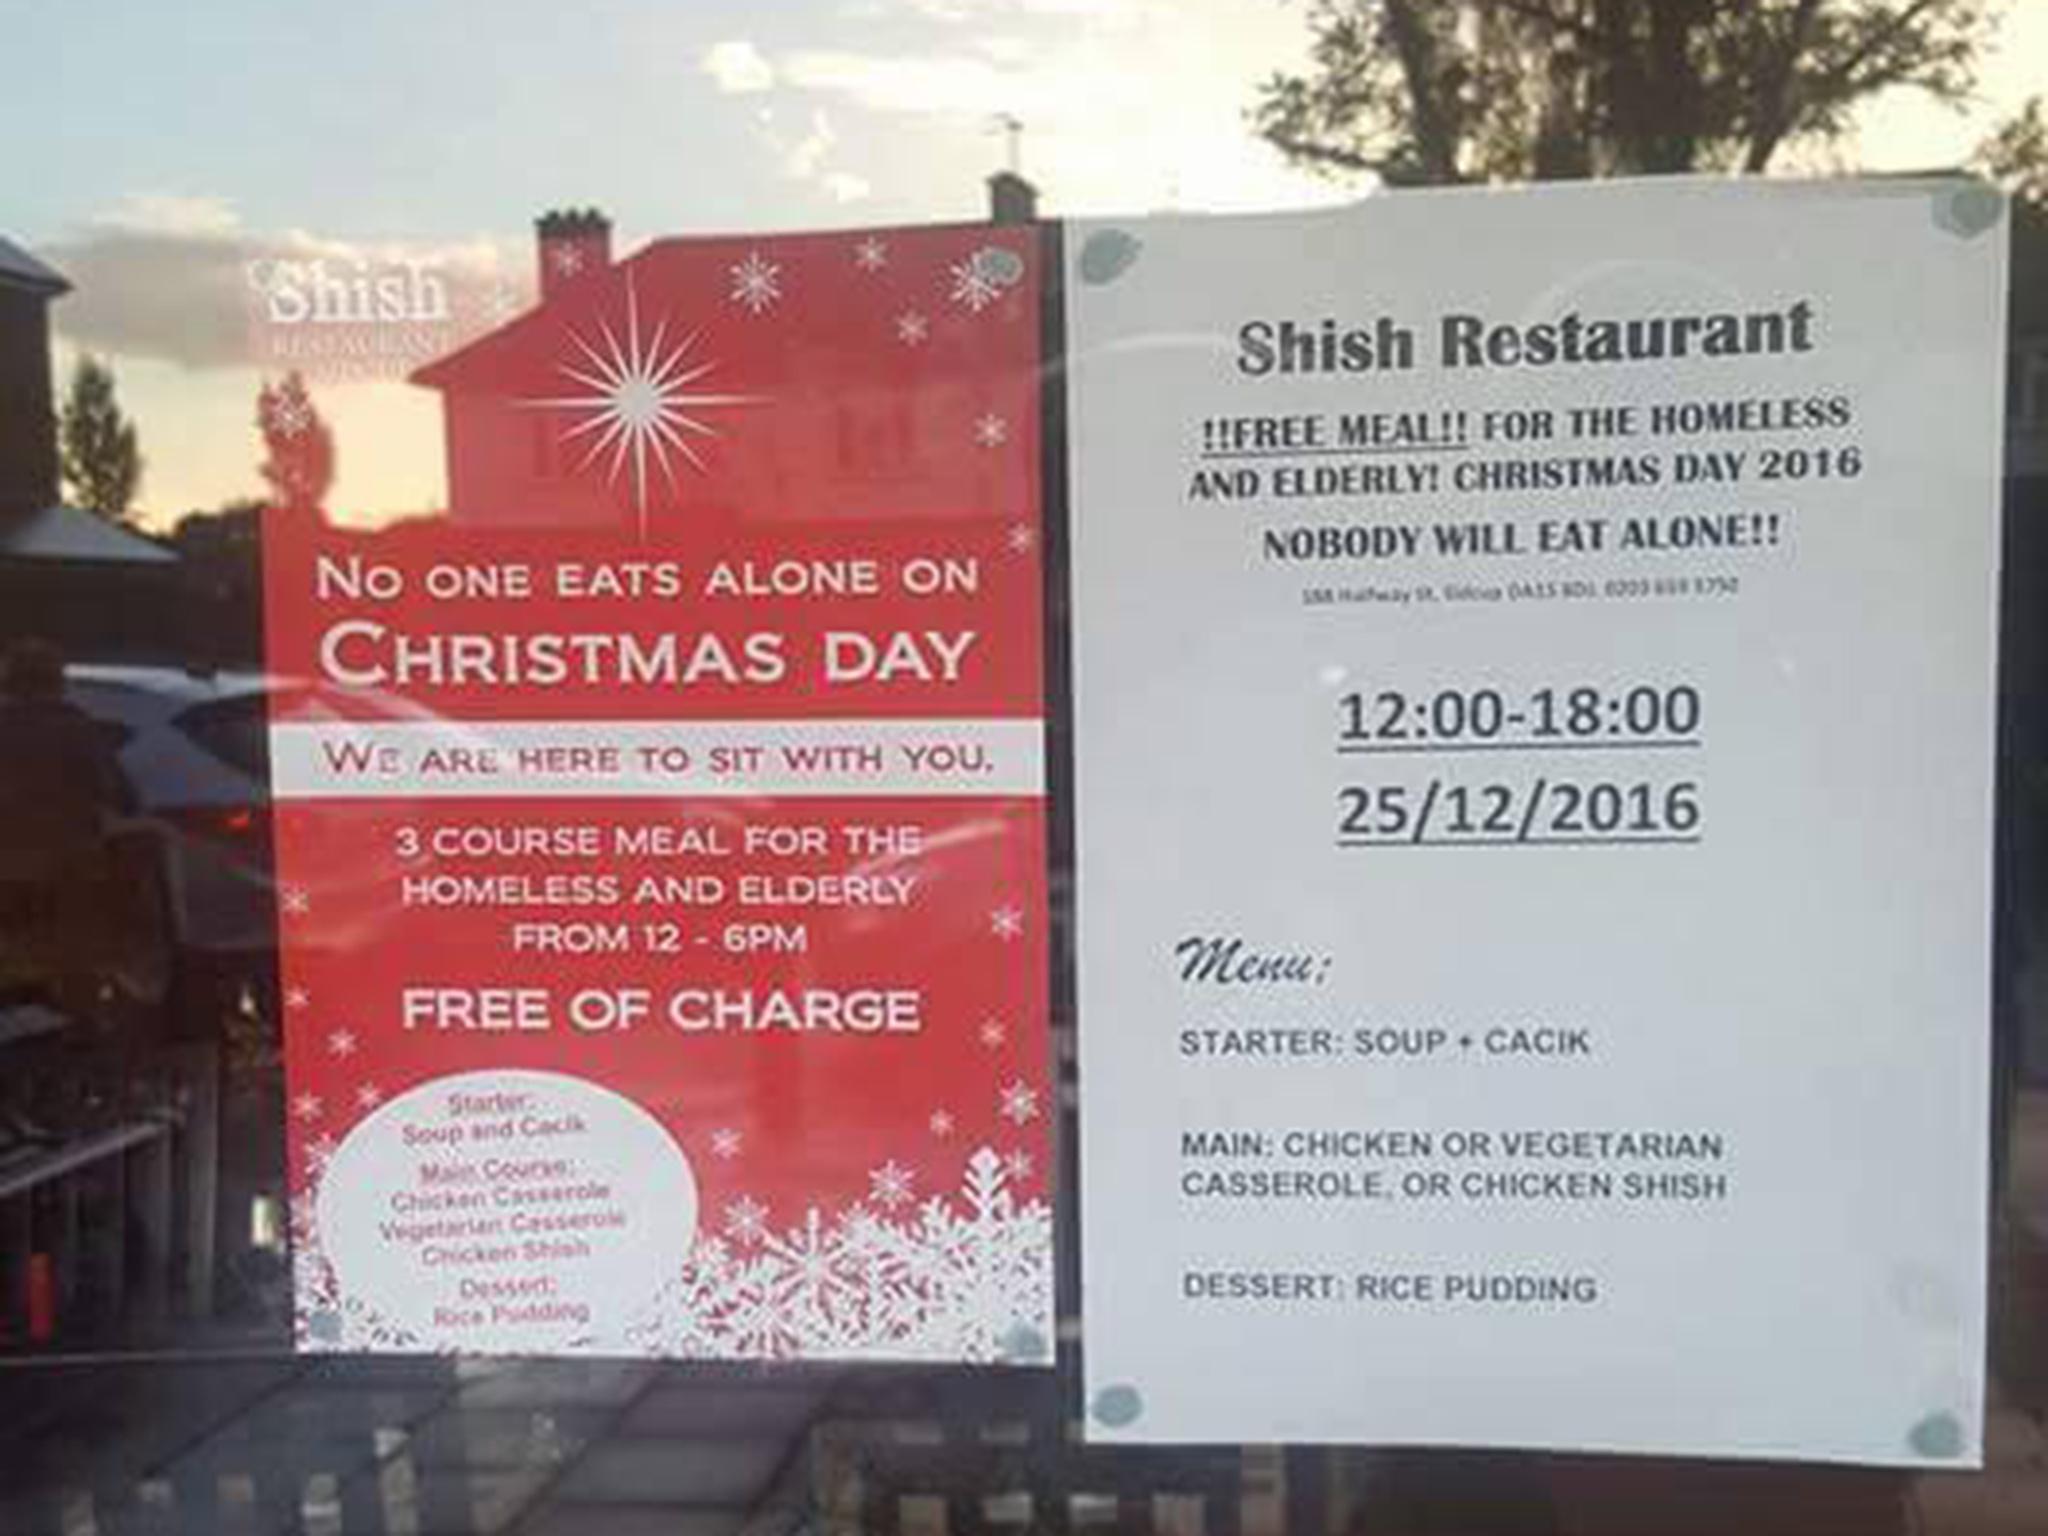 Christmas Restaurant Poster.Muslim Owned Restaurant Offers Elderly And Homeless Free